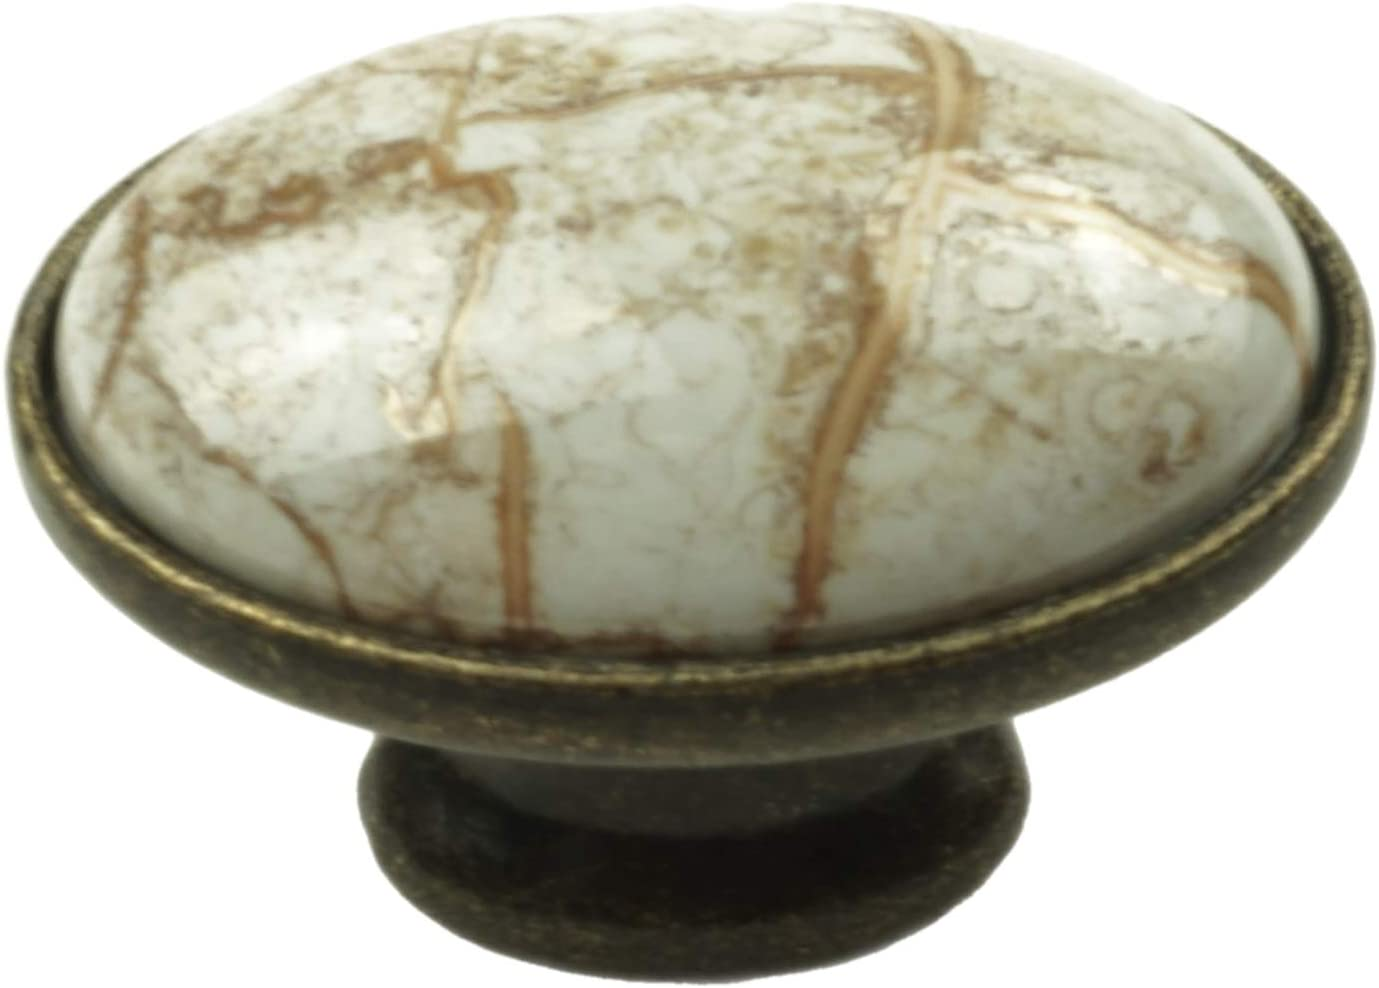 DIY Decor Hub-Set of 10 Antique Brass-Brown Ceramic Oval Knobs, Handles Pulls for Cabinets, Cupboard Dresser, Drawers, Kitchen Furniture or Kids Room